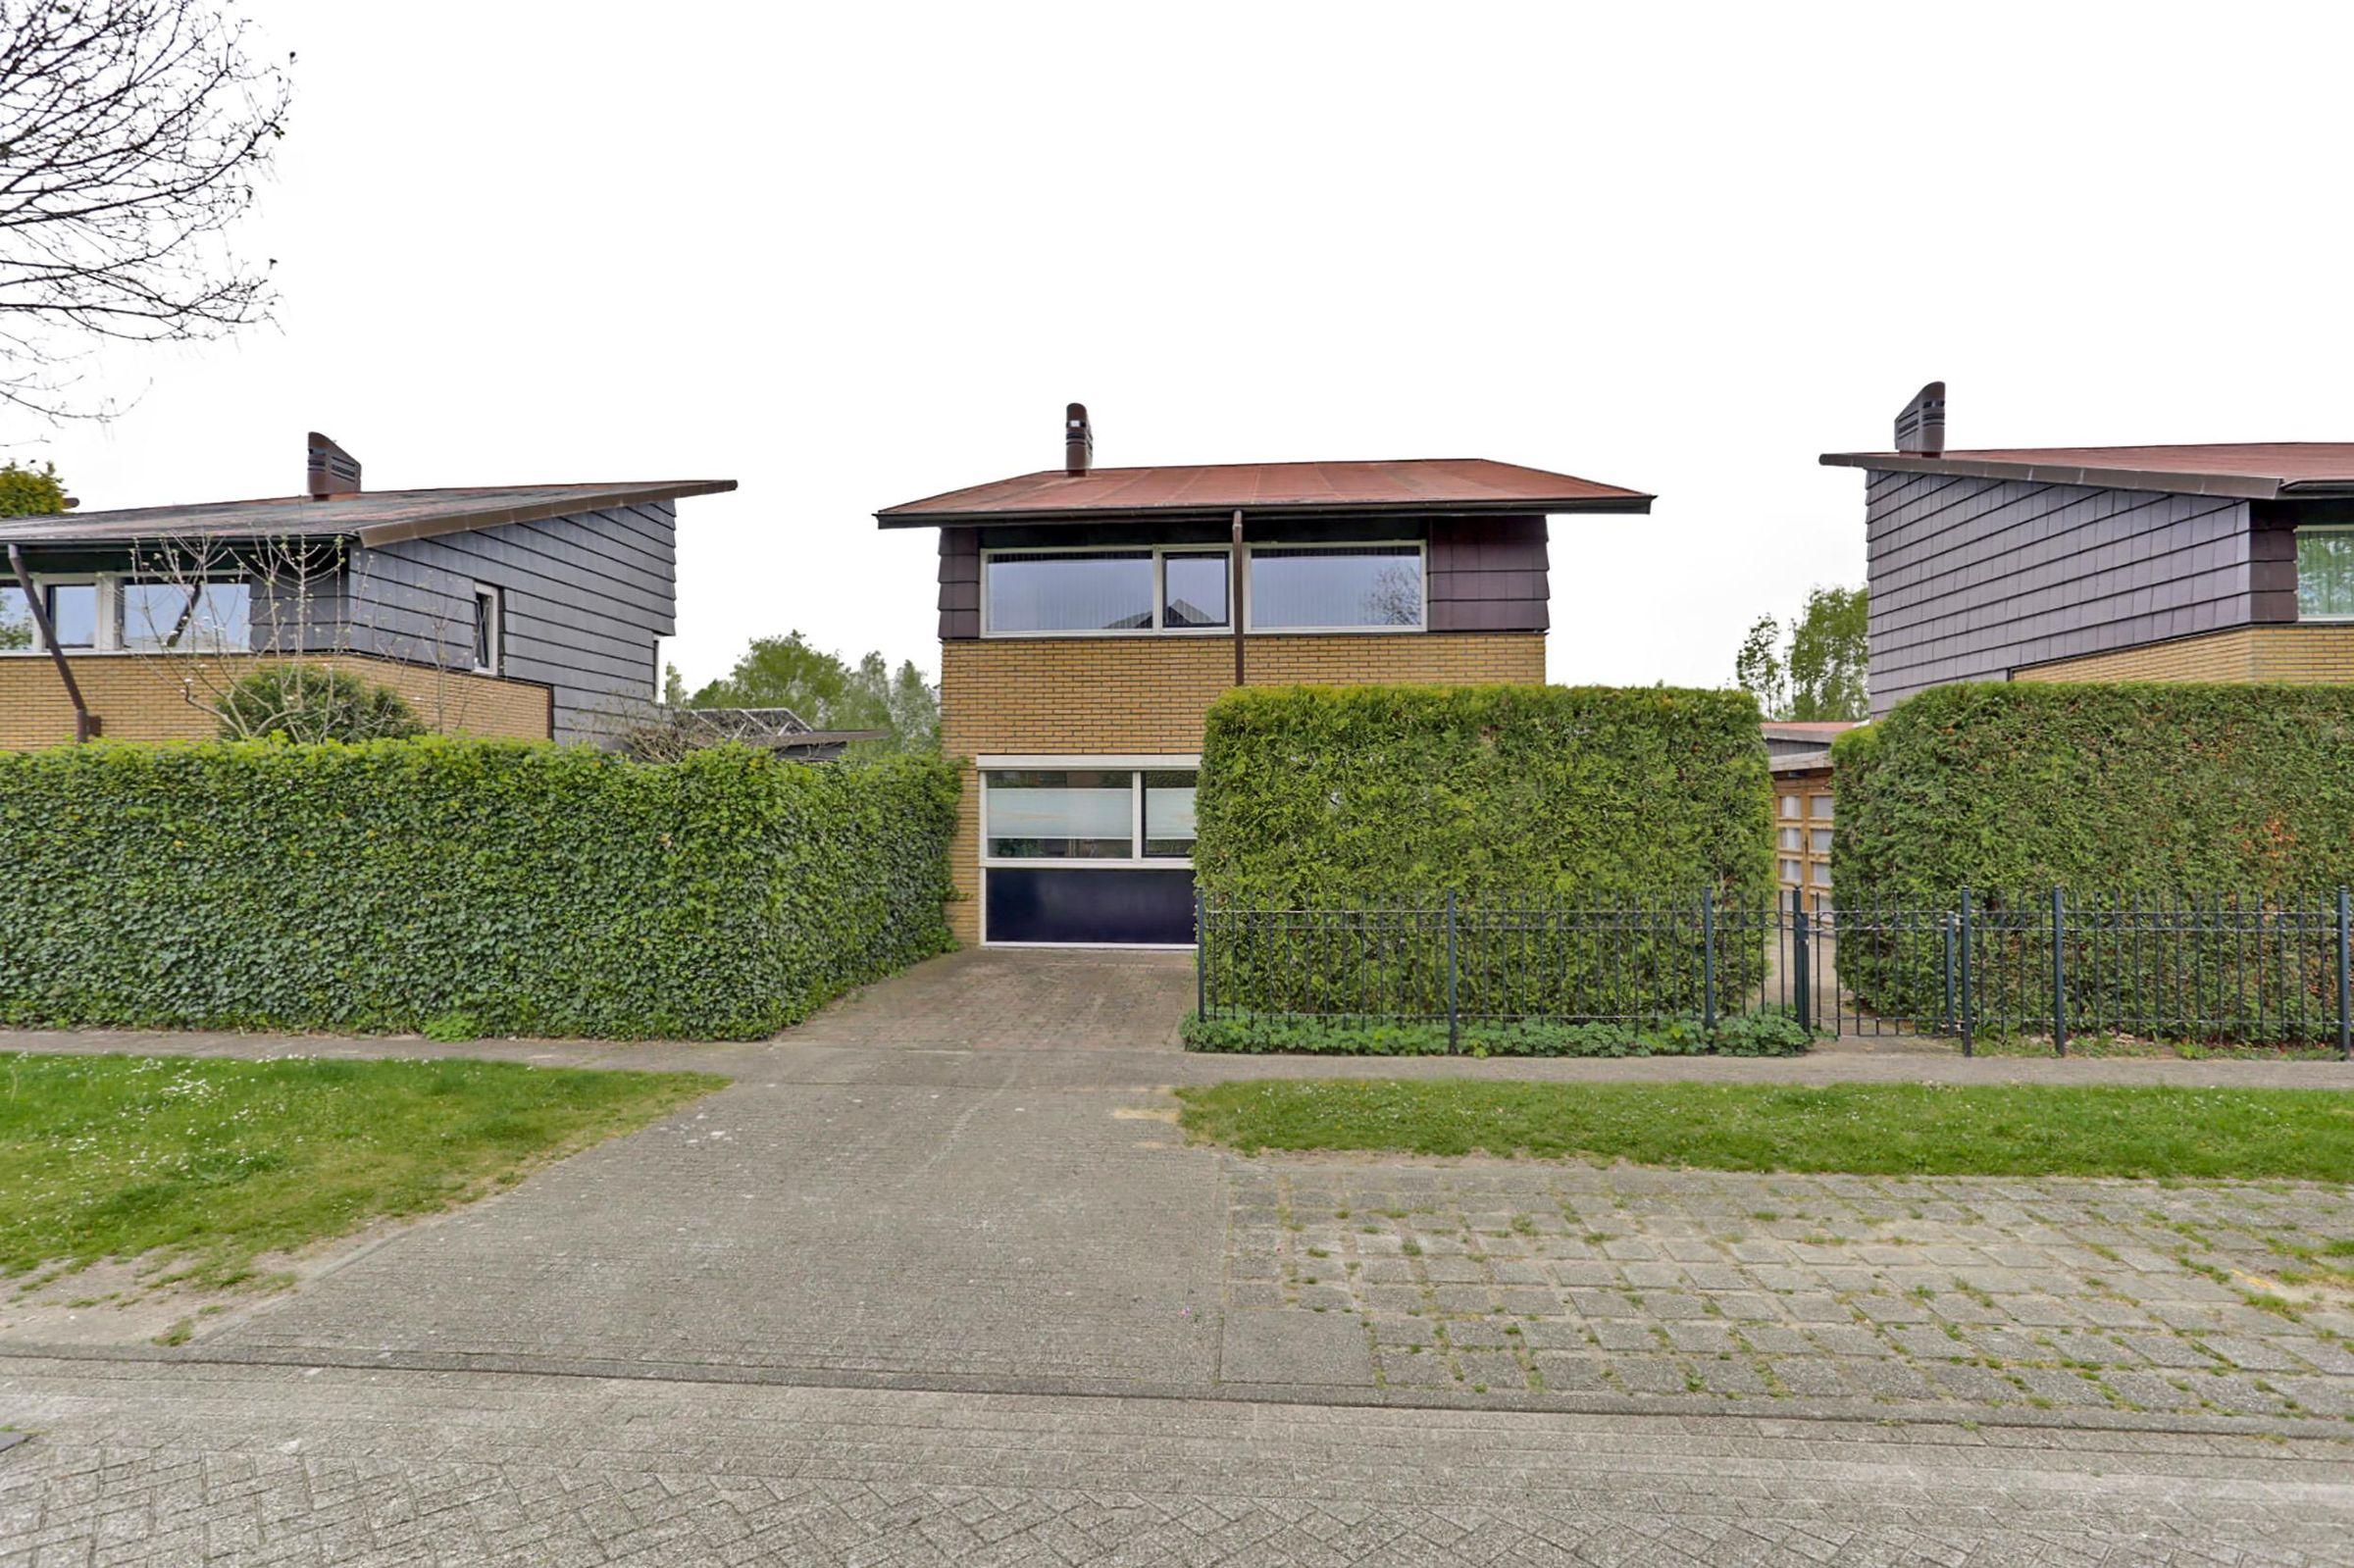 Kwartaalstraat 21, Almere